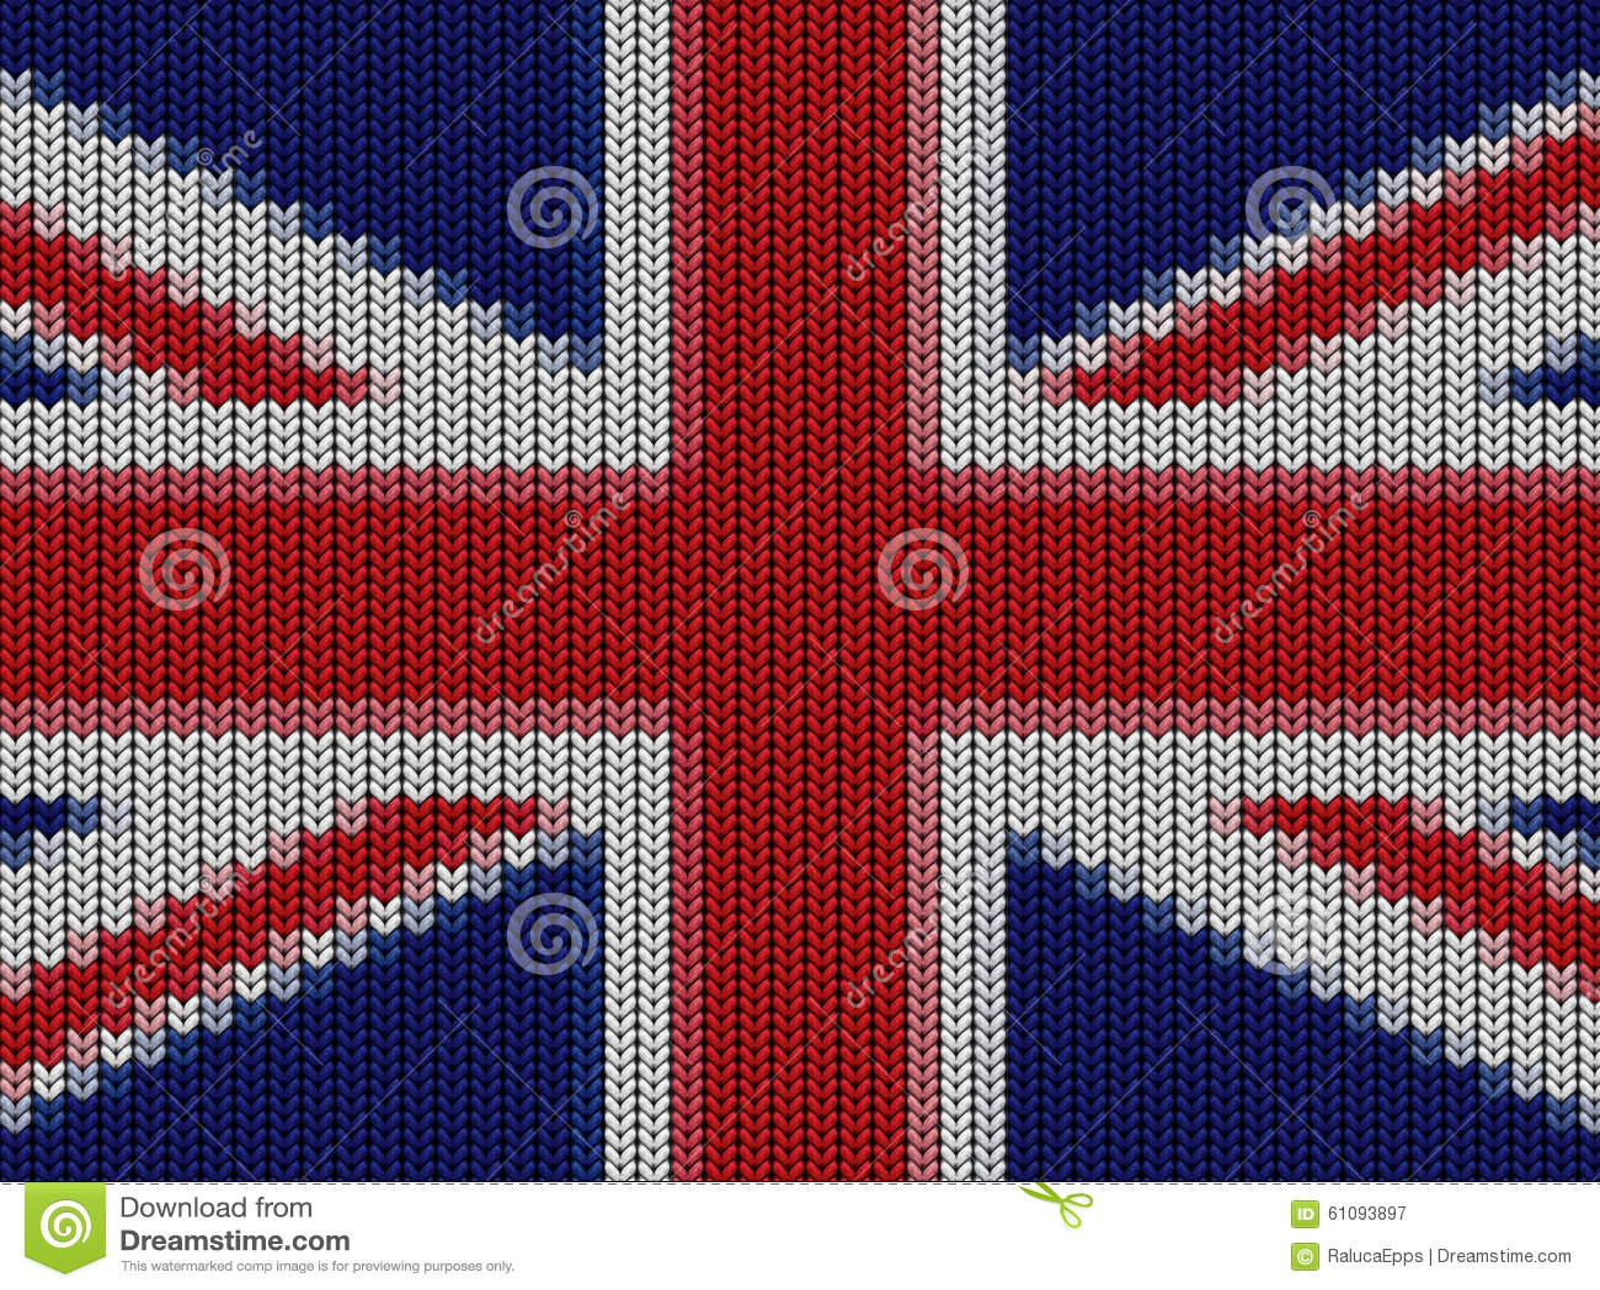 Knitting Pattern Us Flag : UK English Flag In Knitting Pattern Stock Illustration - Image: 61093897